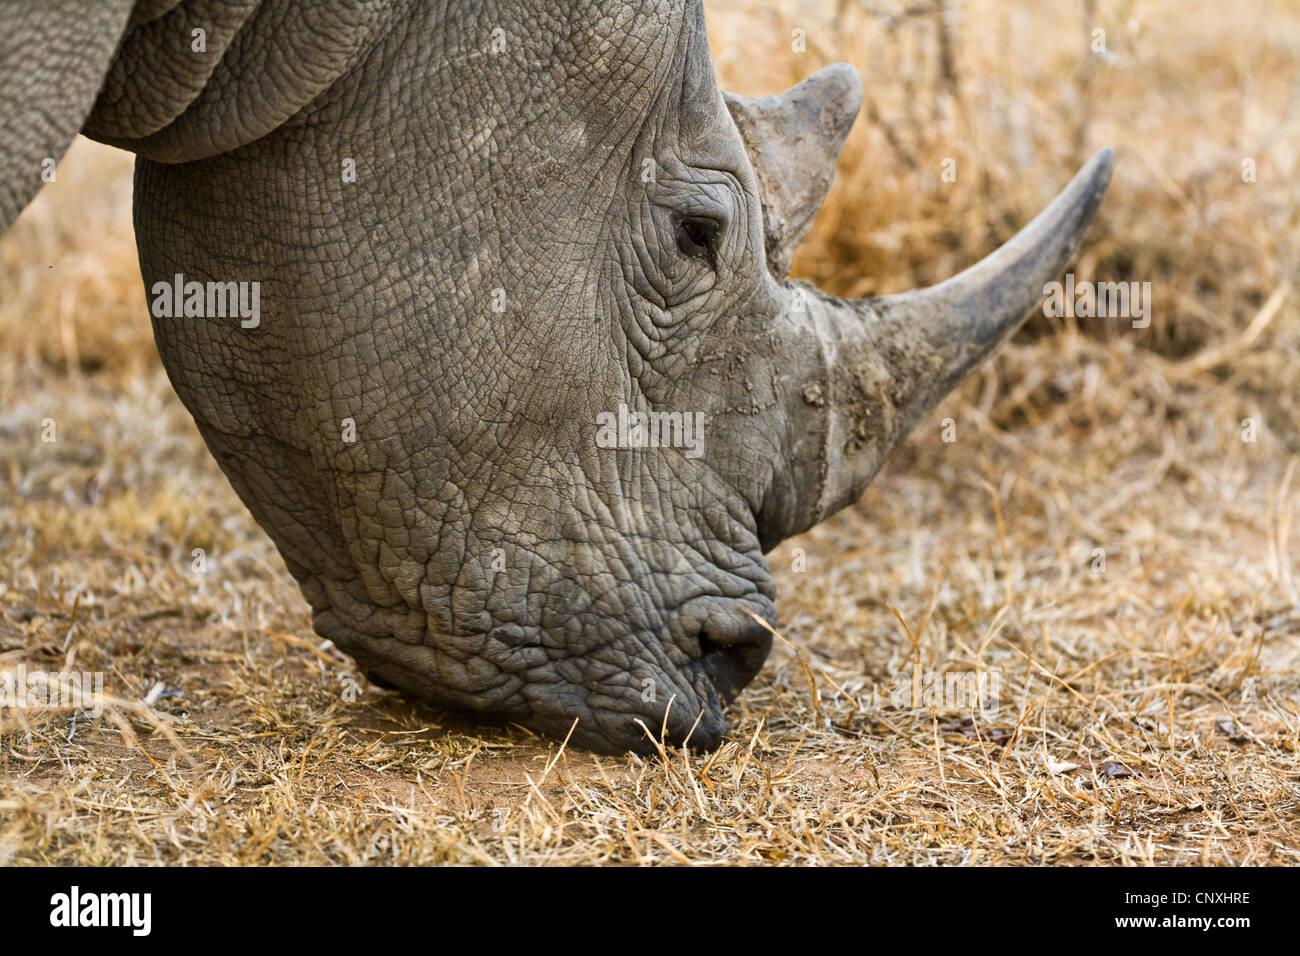 white rhinoceros, square-lipped rhinoceros, grass rhinoceros (Ceratotherium simum), grazing, South Africa, Krueger National Park Stock Photo